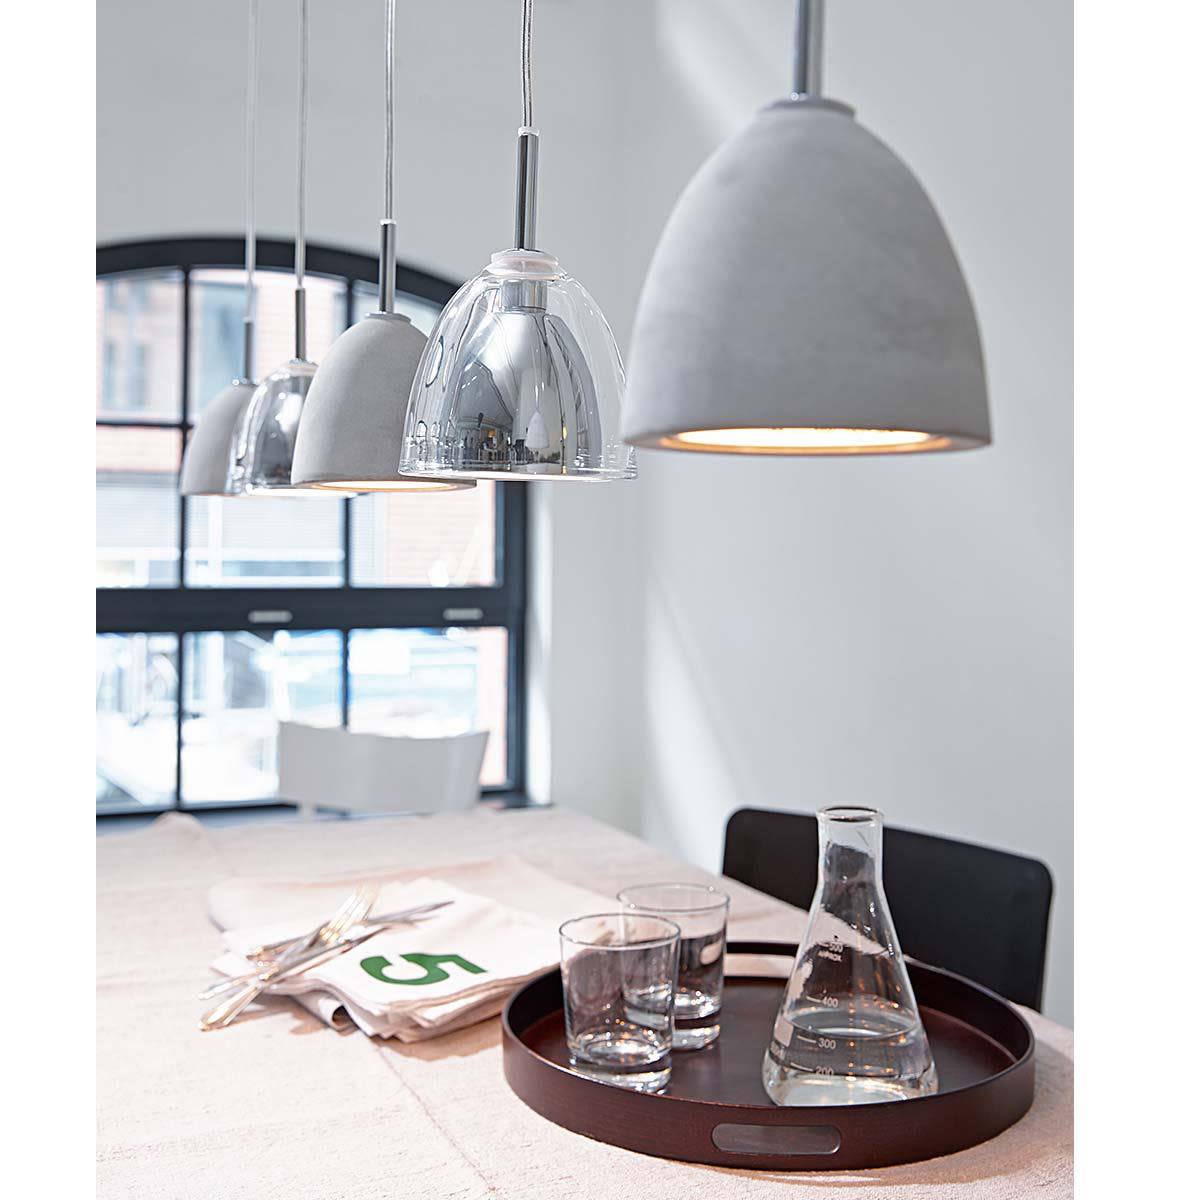 Decor lampen esszimmer for Esszimmer lampe